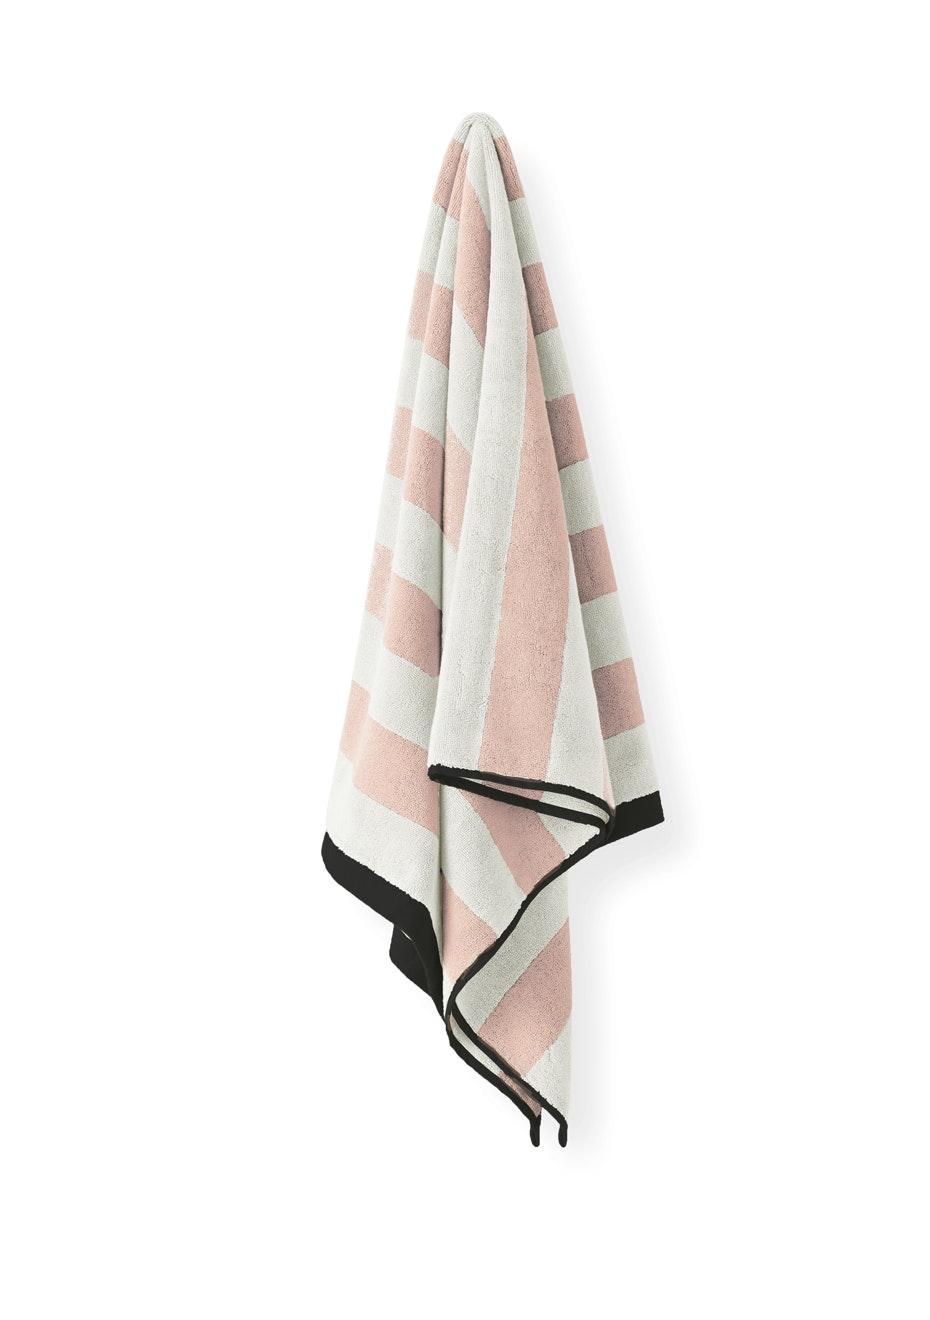 Aura Stripes Bath Sheet 900 X 1650Mm Pink